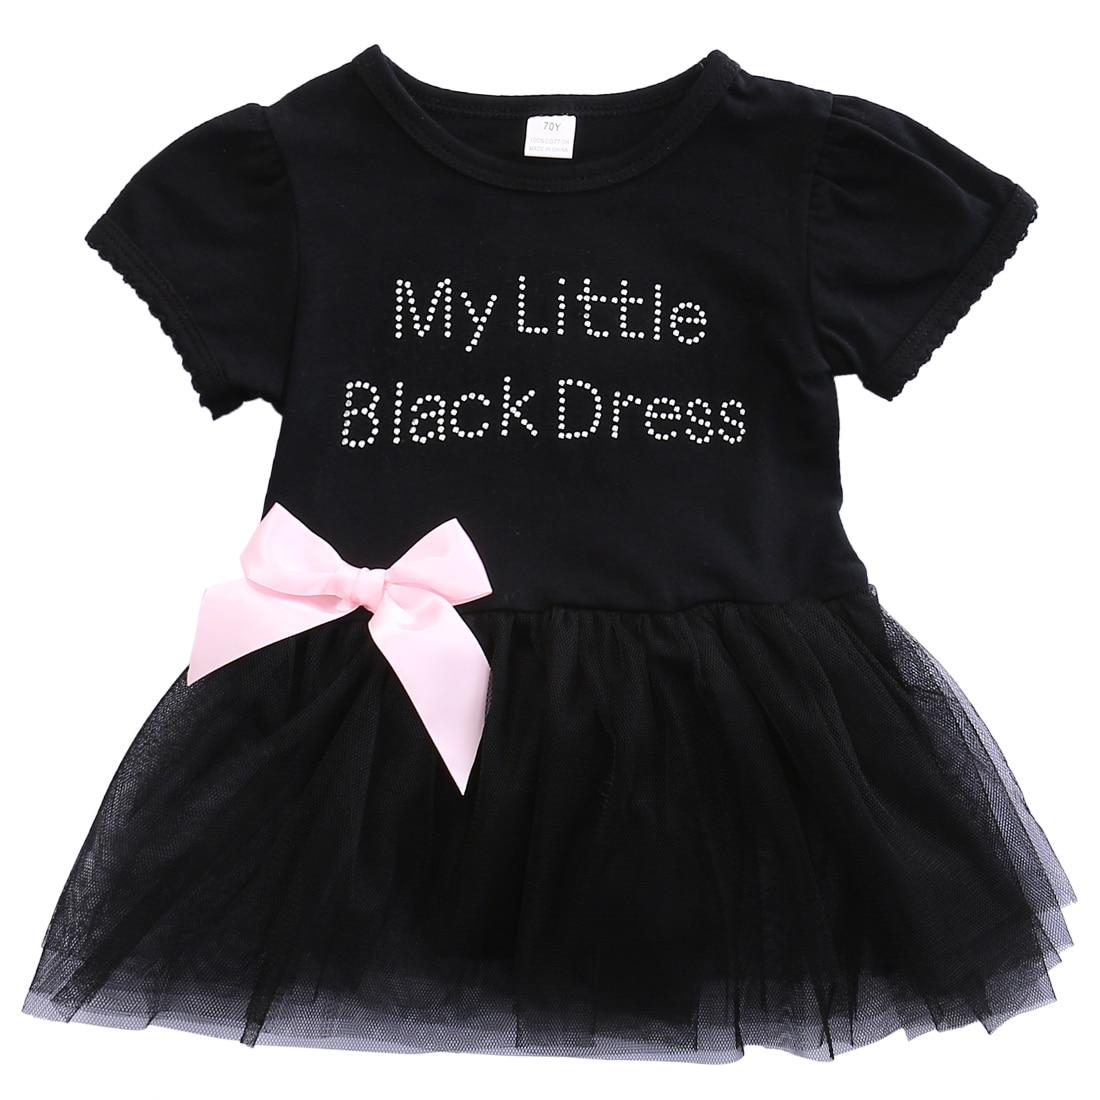 Black dress for baby girl - My Little Black Dress Infant Baby Girls Short Sleeve Tutu Dress Lace Bowknot Mini Party Dress